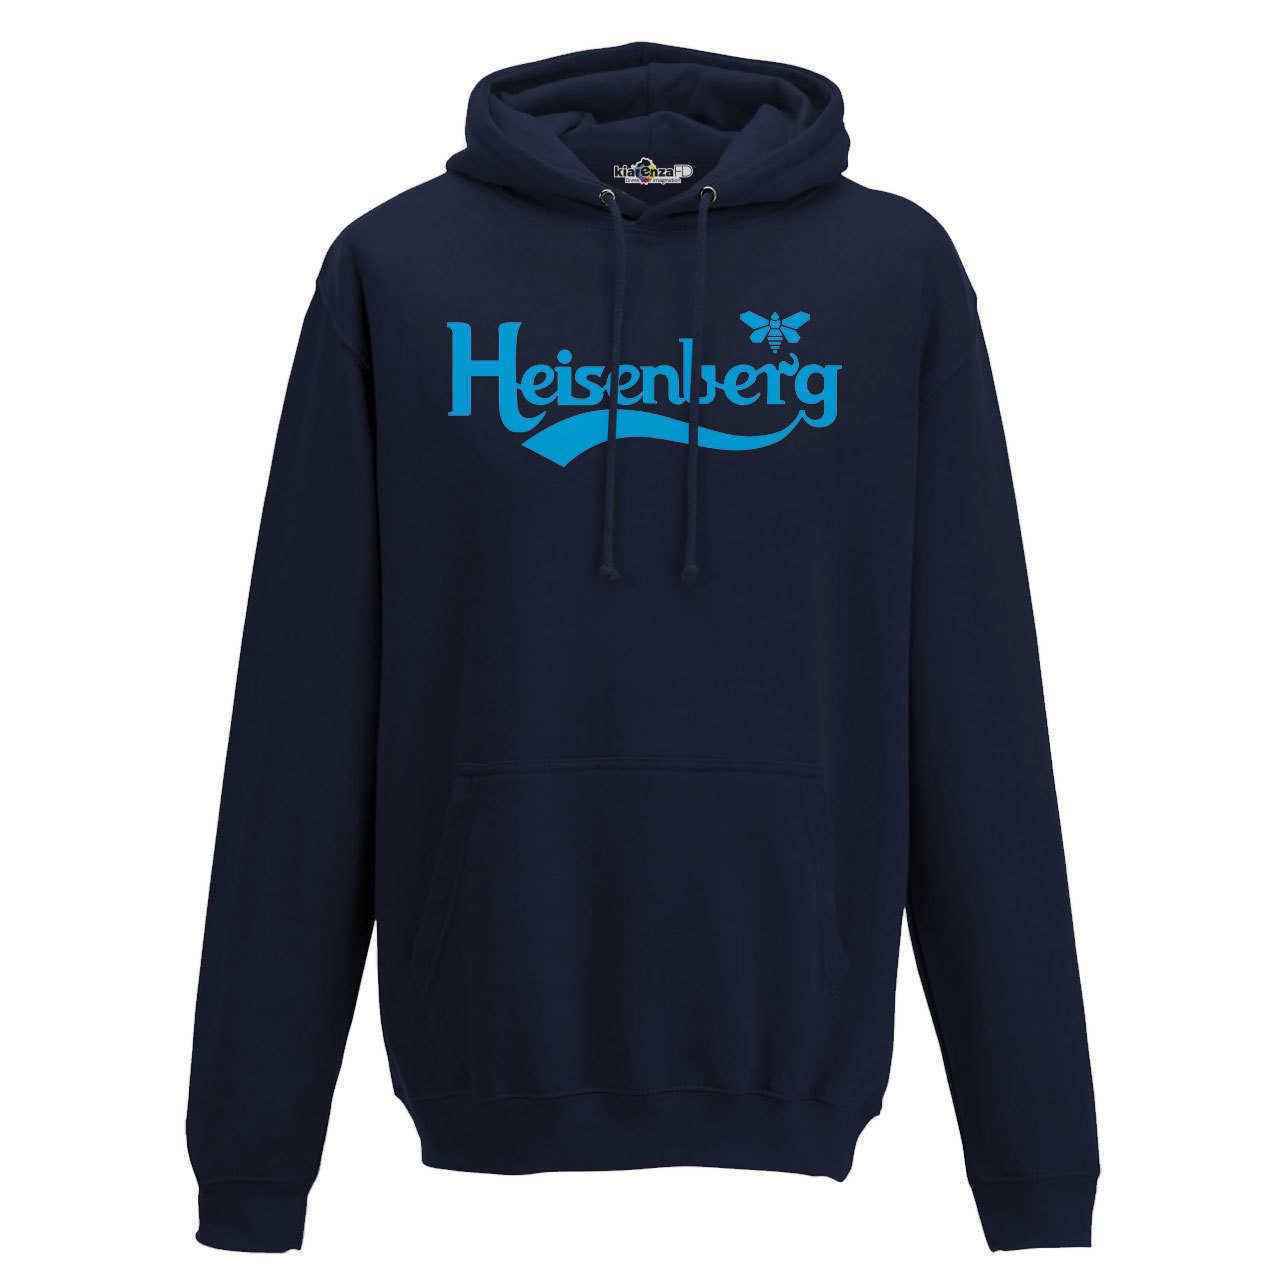 Capuz camisola quebrando bad heisenberg paródia cerveja 2 s